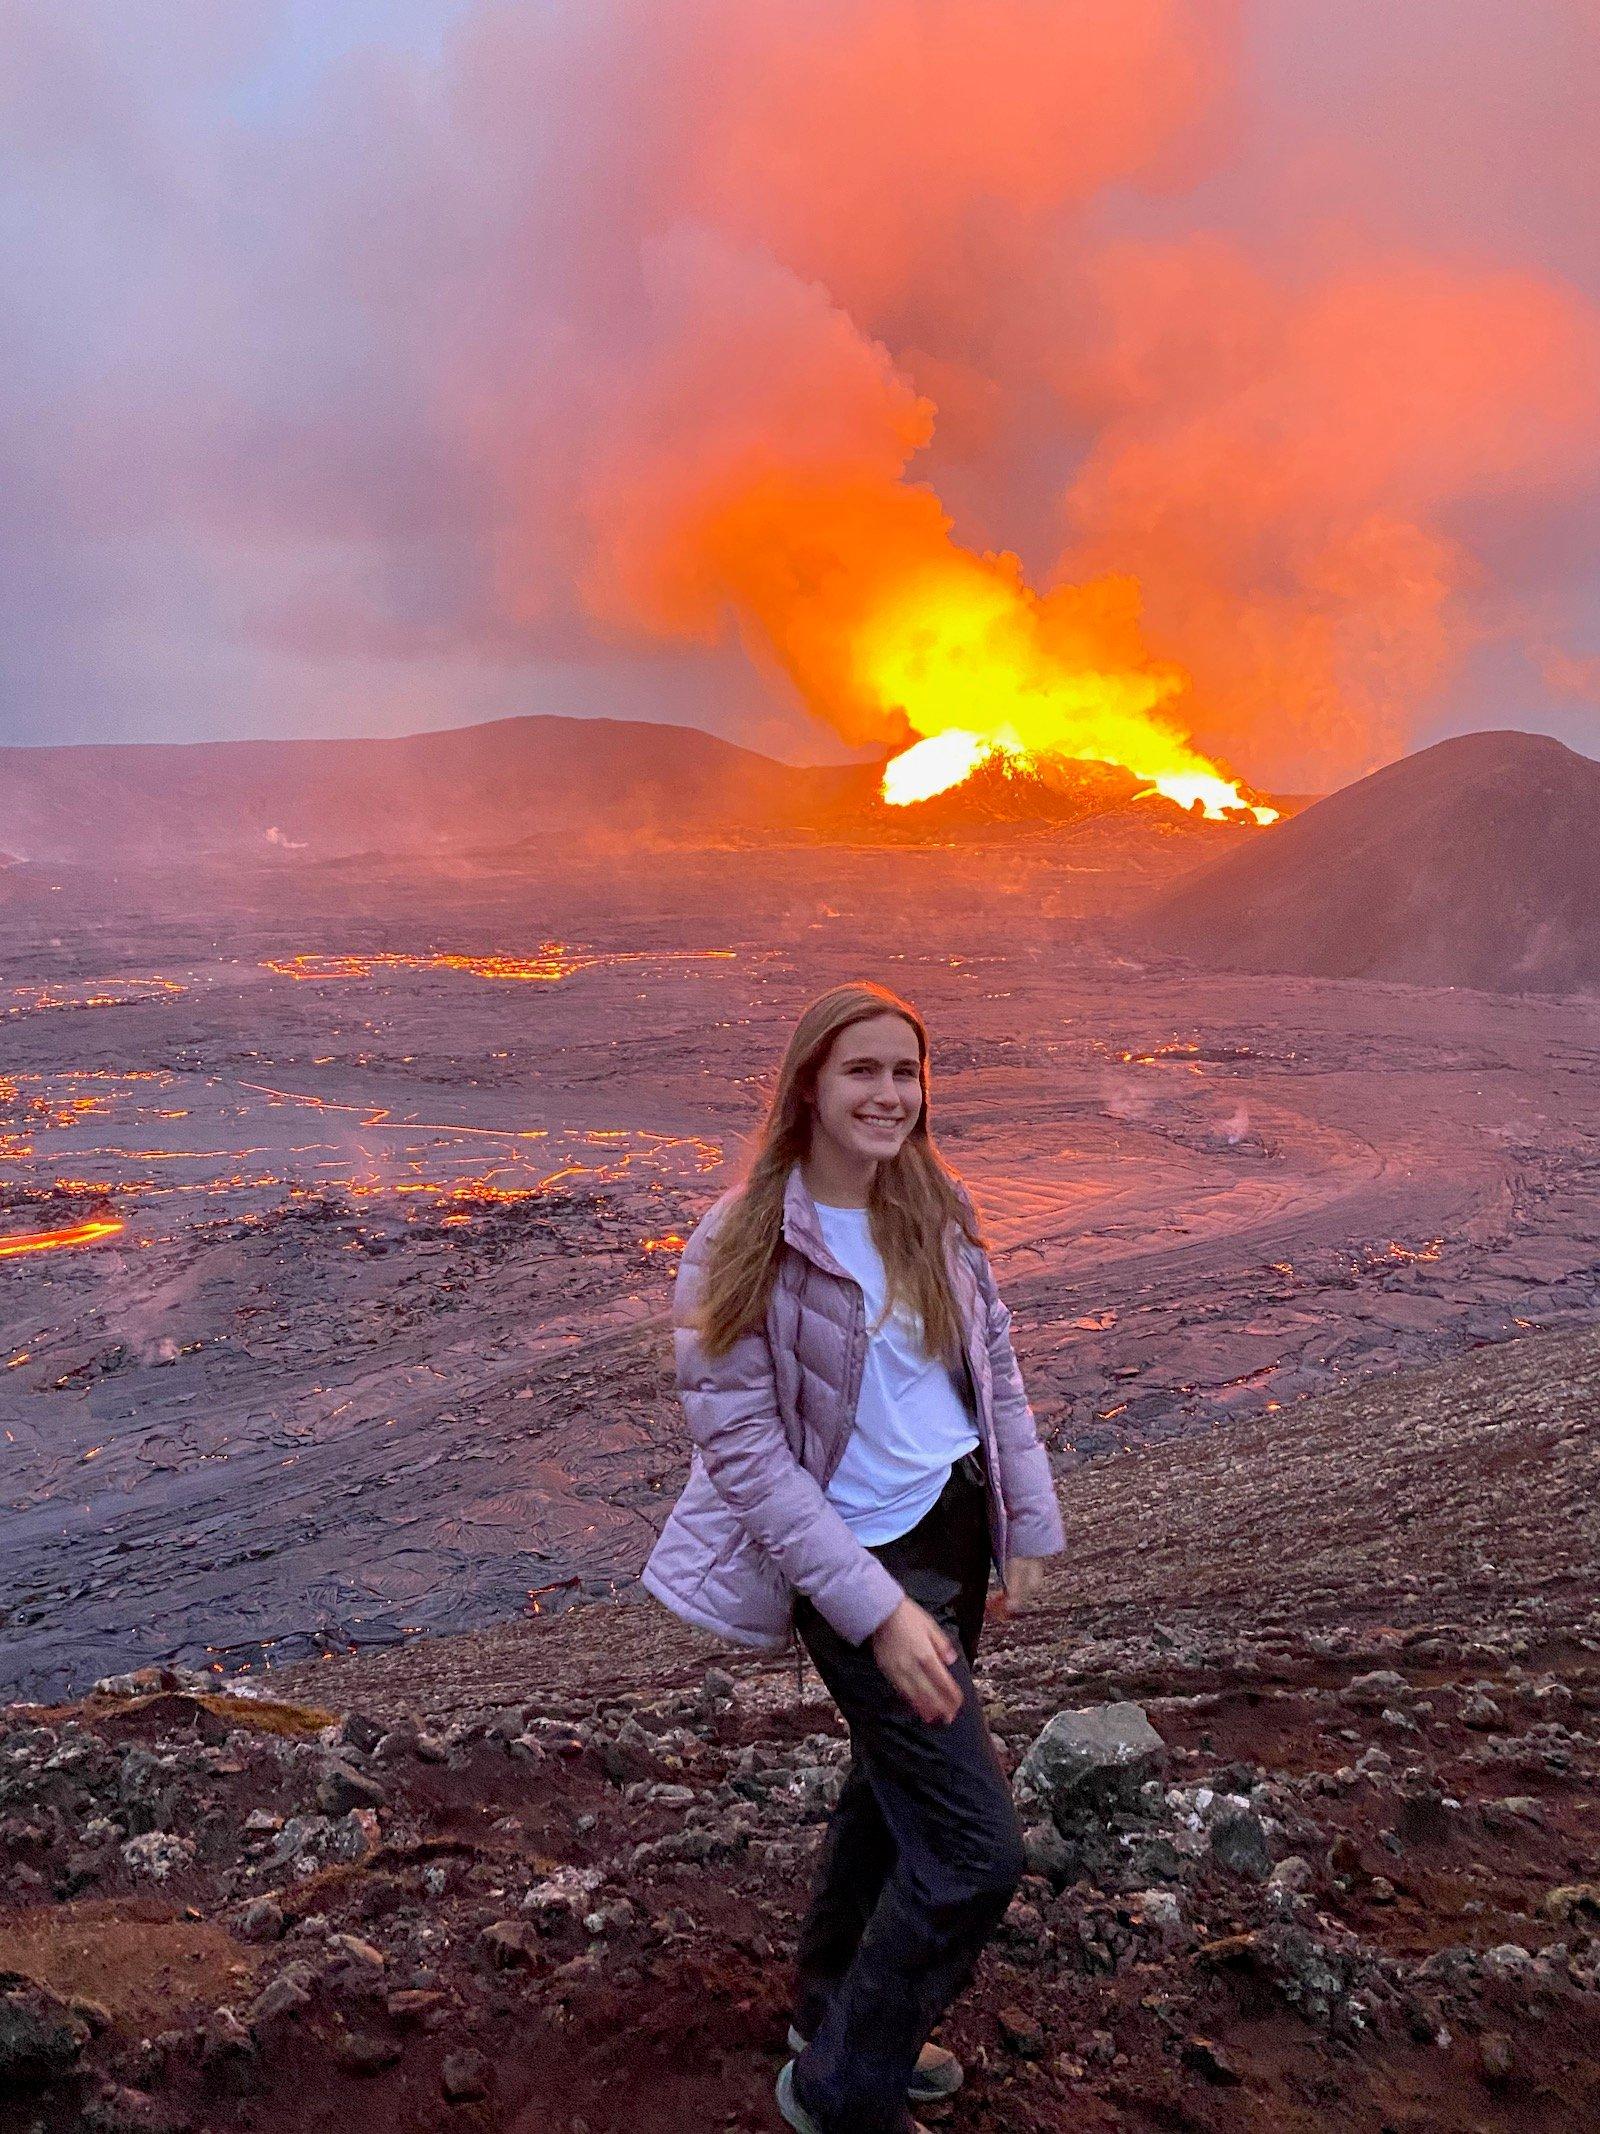 Teen girl posing in front of the erupting Fagradalsfjall Volcano.